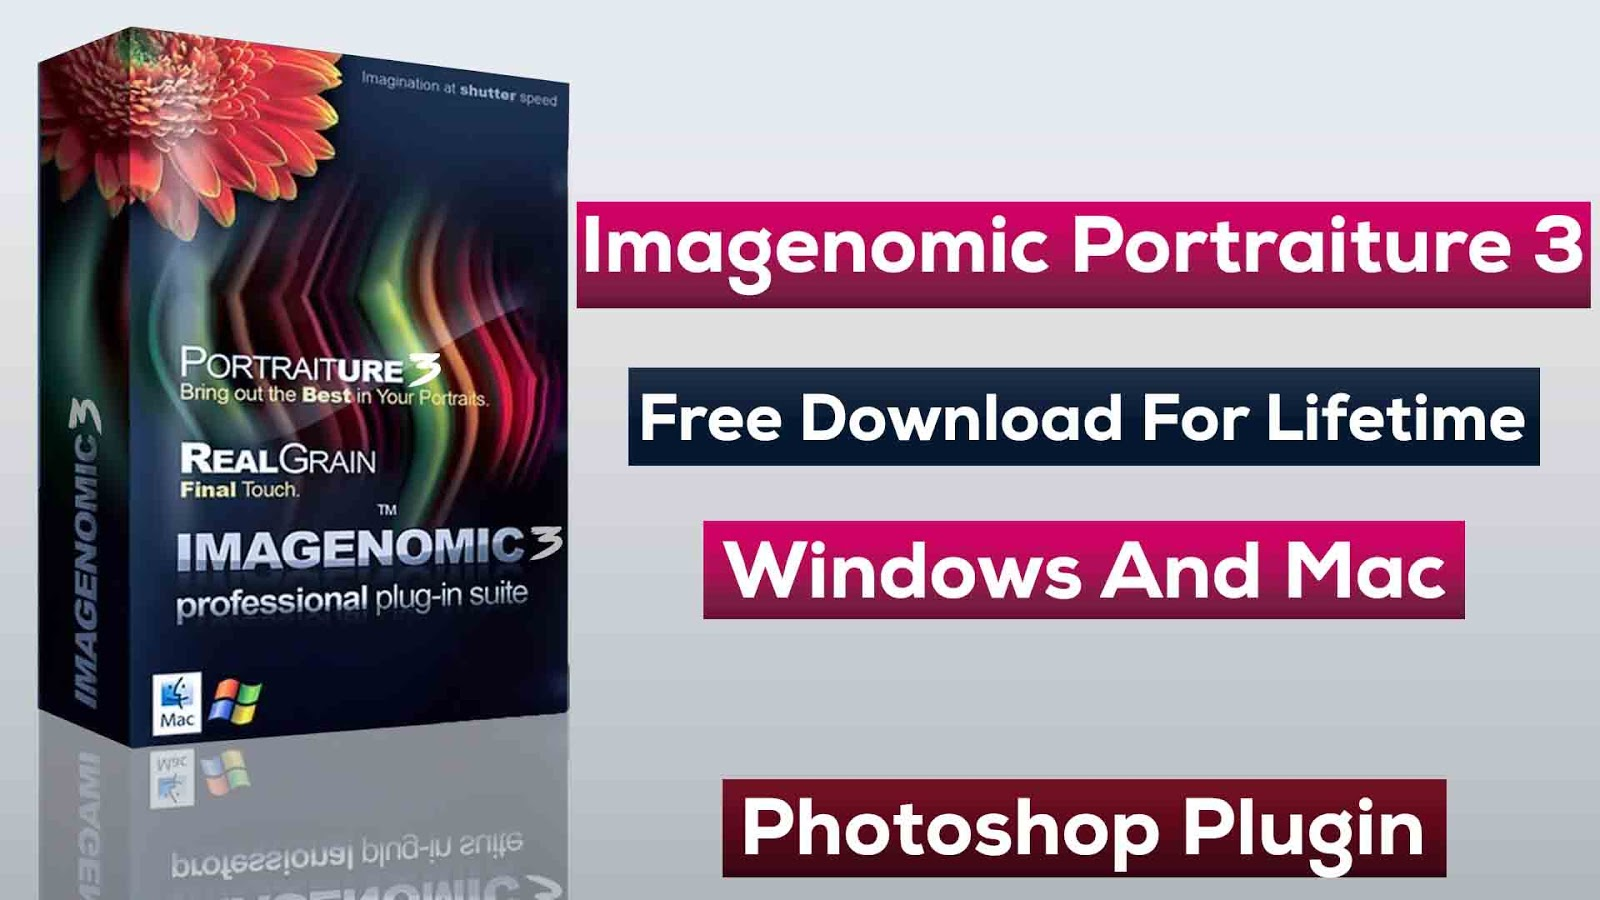 Imagenomic Portraiture 3 Free Download For Lifetime Windows